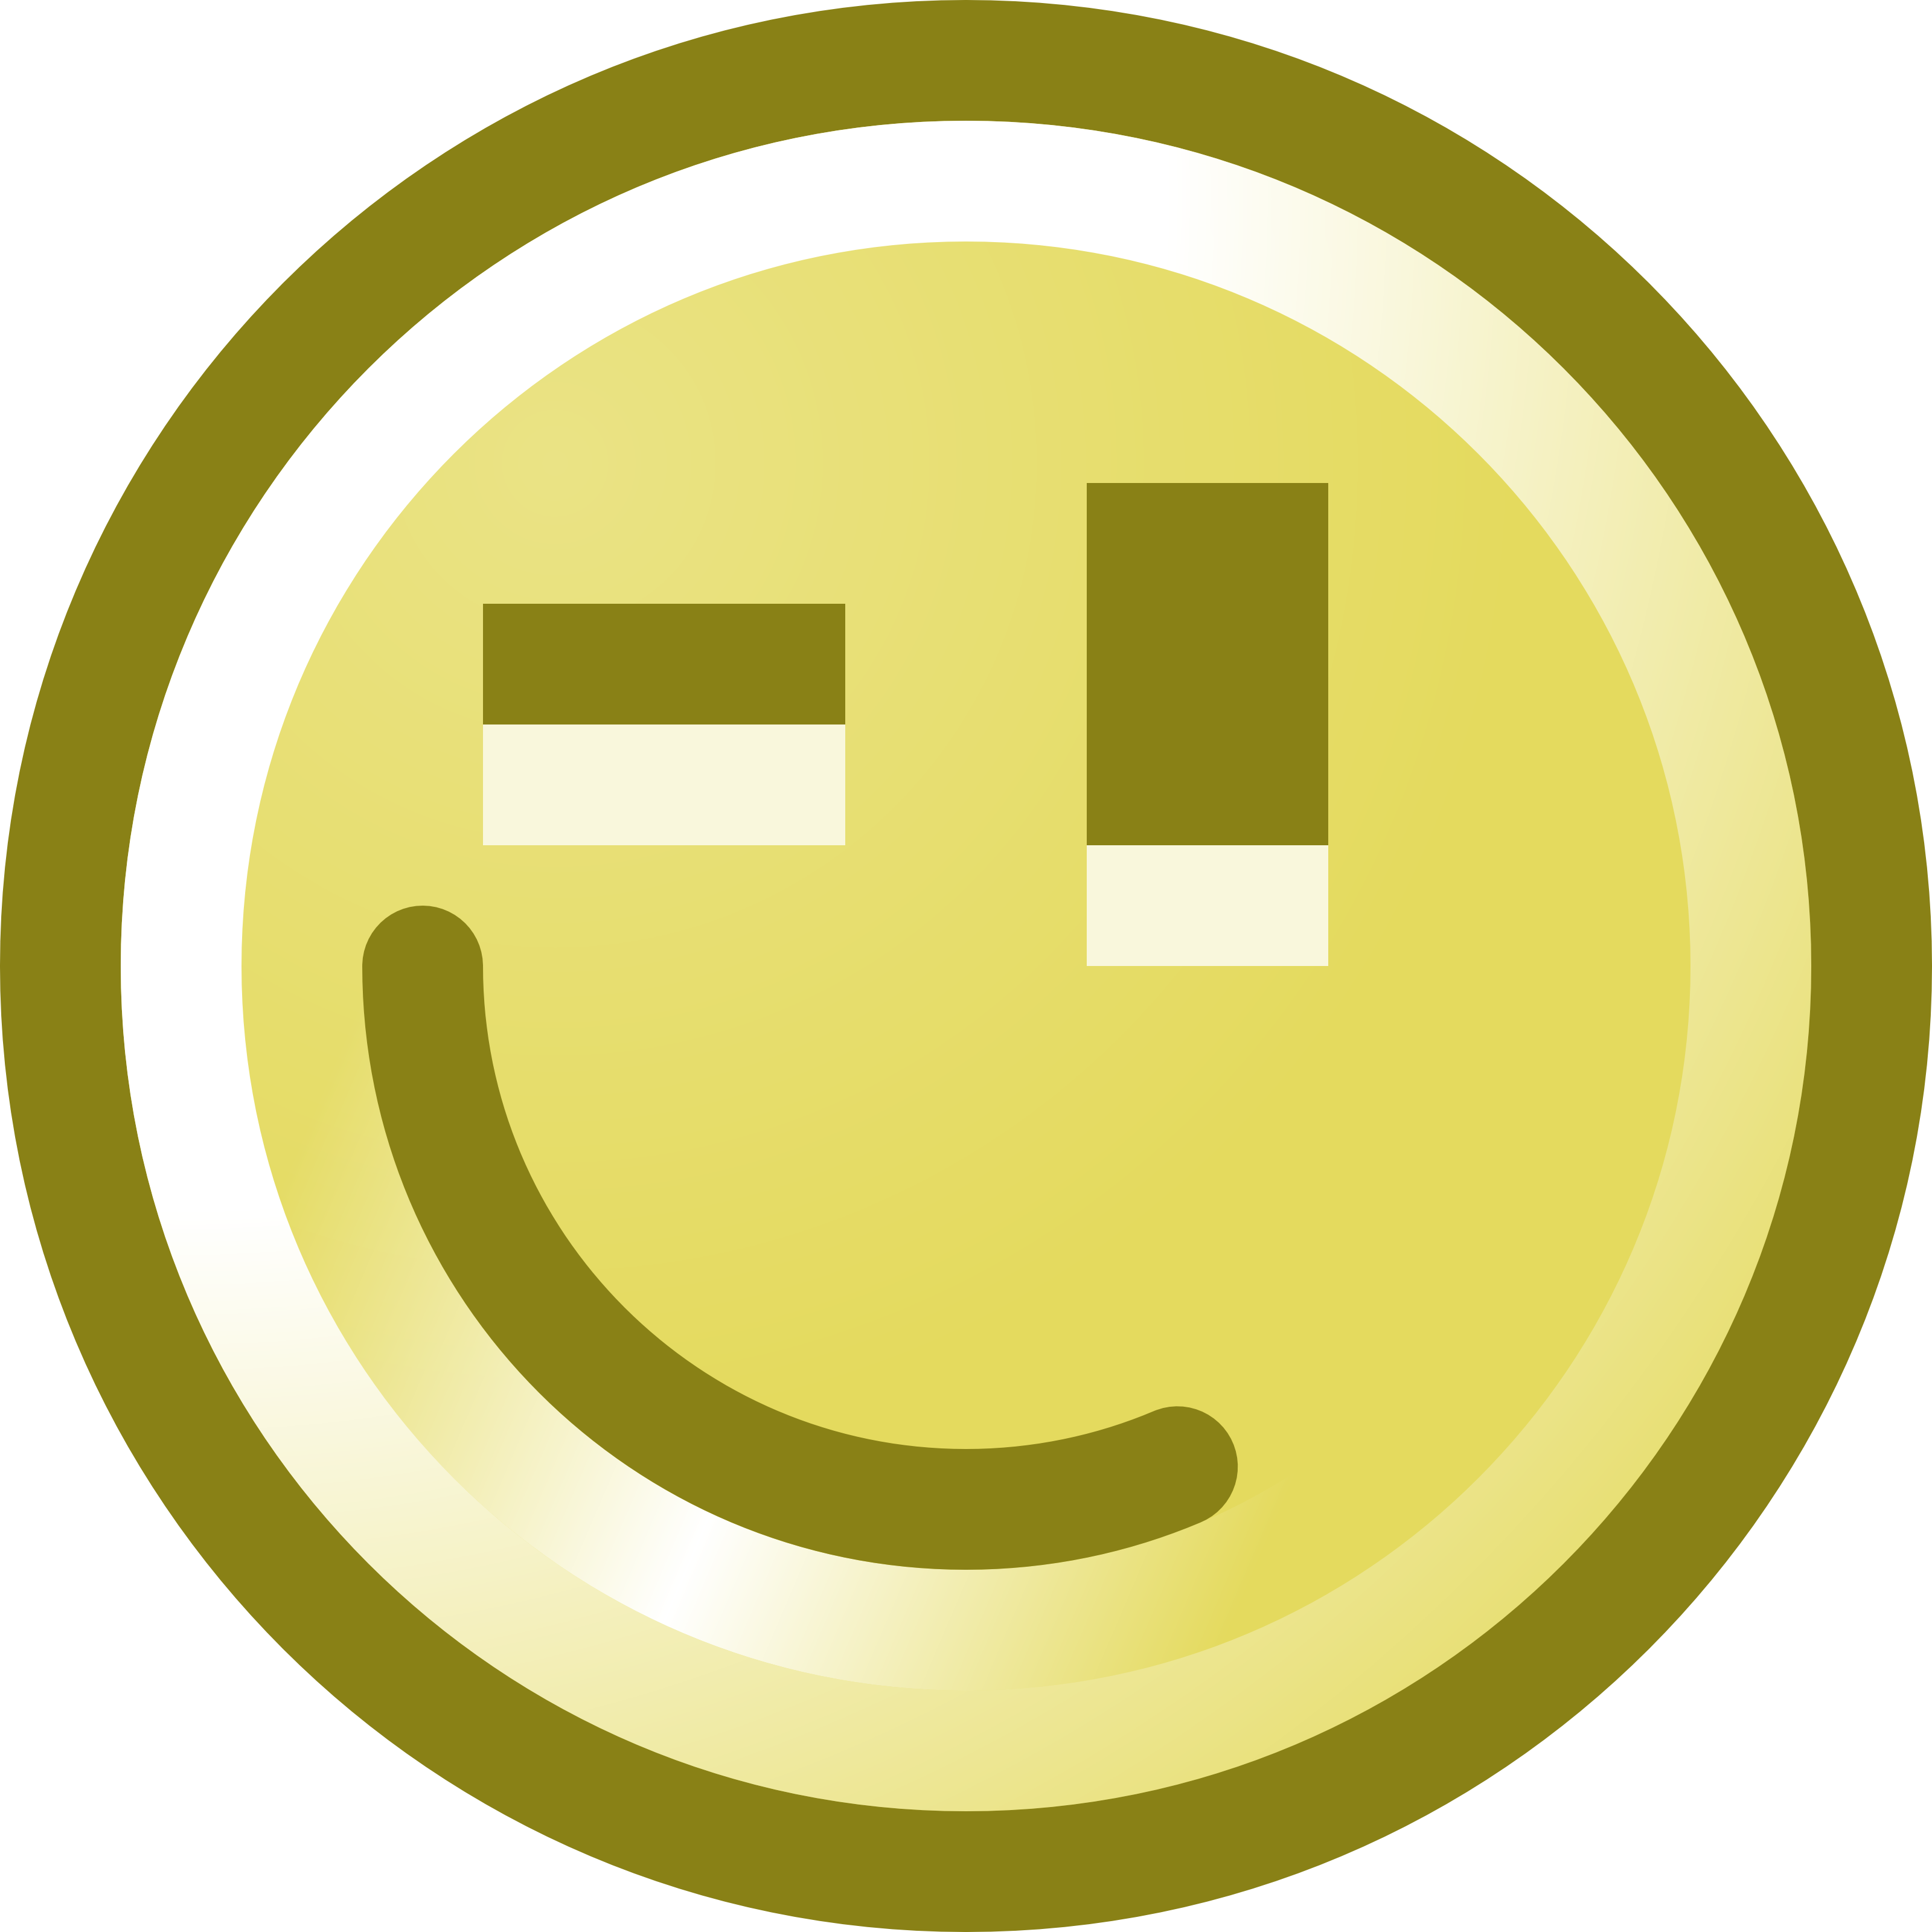 free winking smiley face clip art illustration rh free clipartof com  winking smiley face clip art free